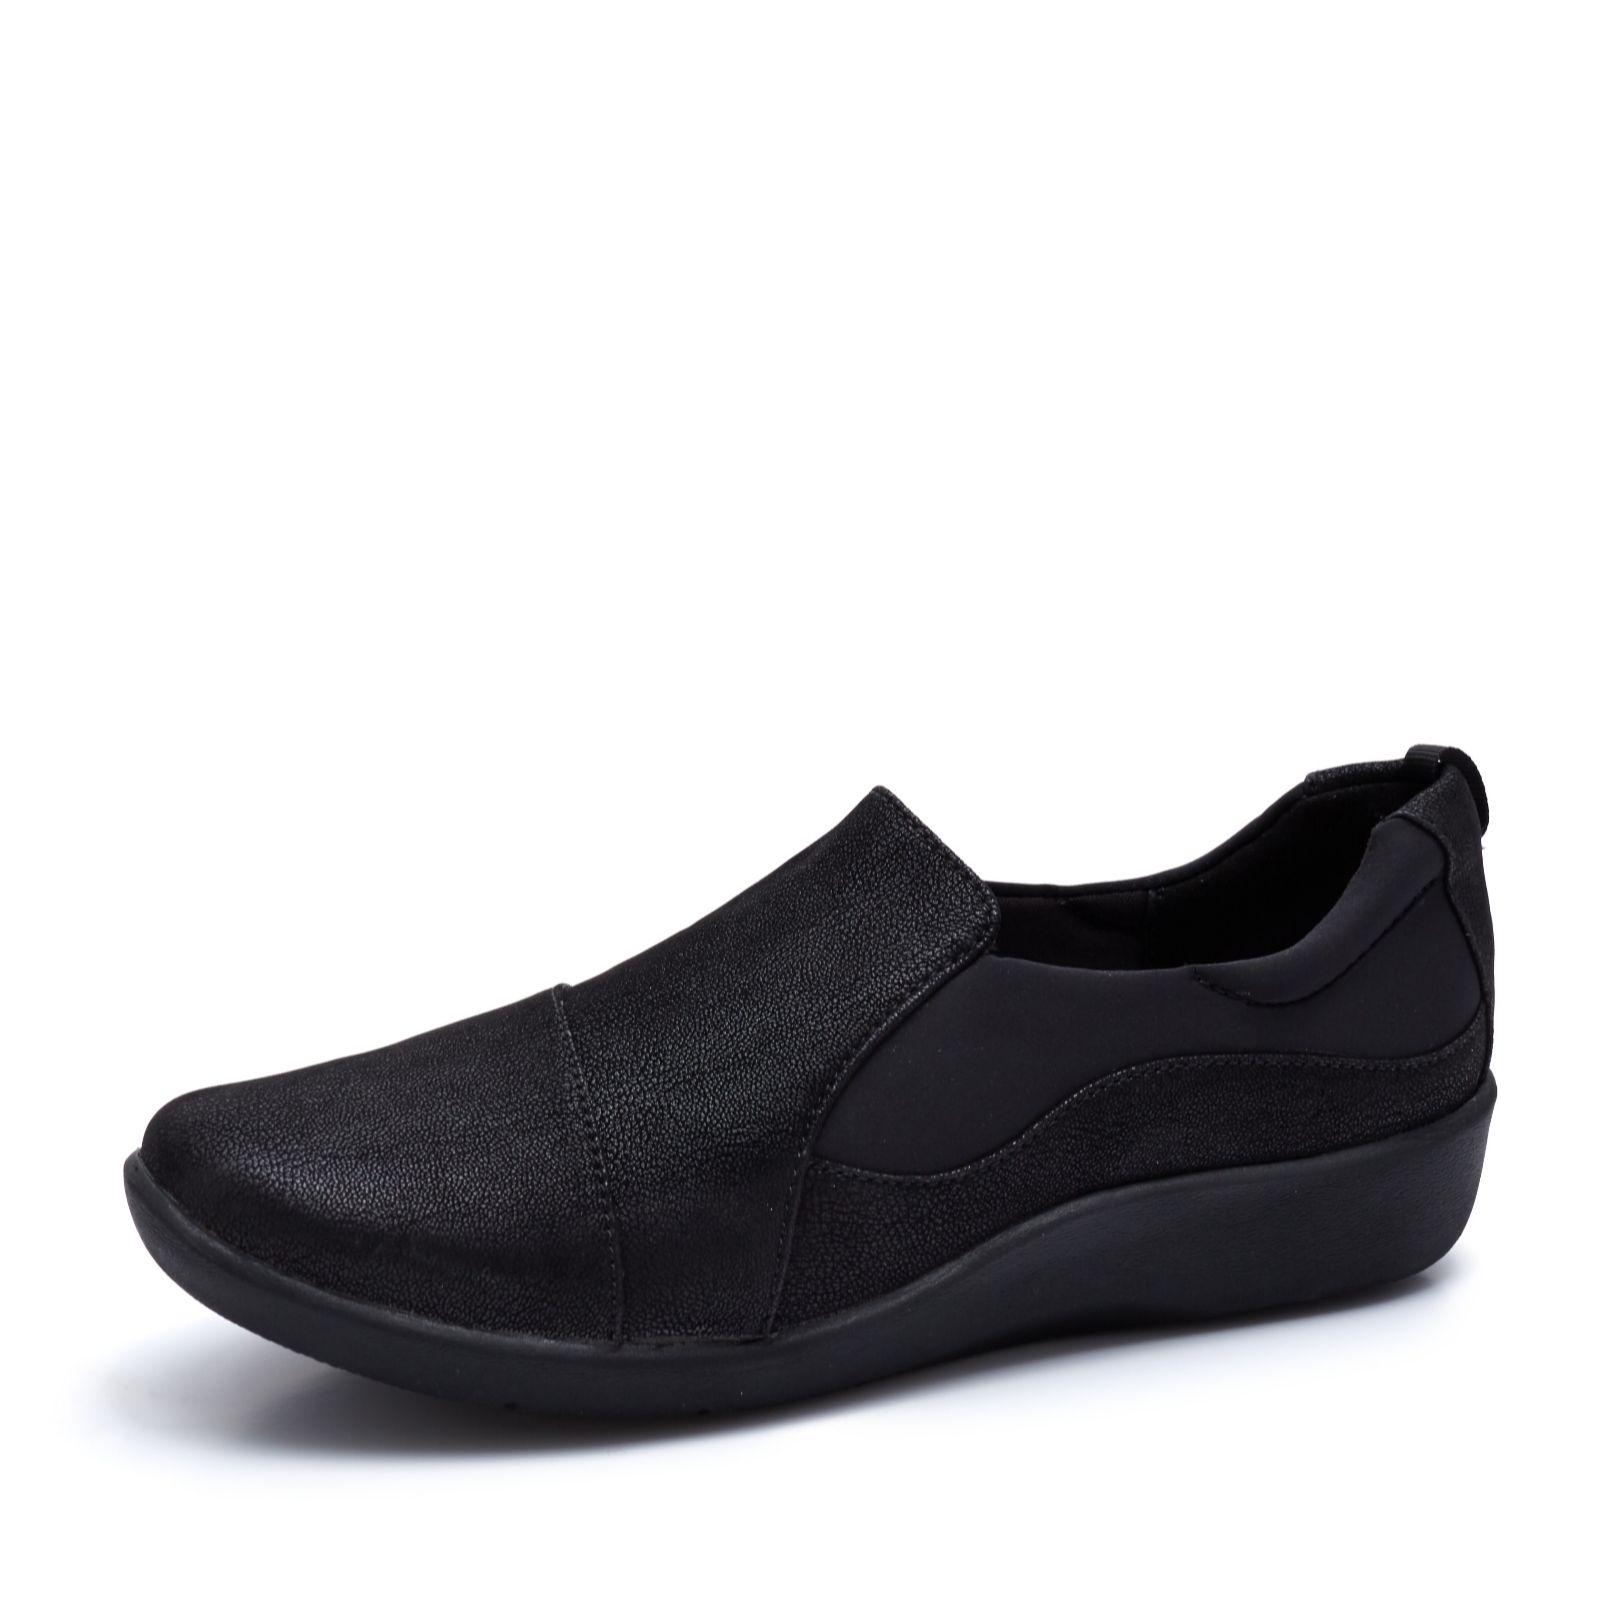 65b30674a85b8 Clarks Cloudstepper Sillian Paz Slip On Shoe Wide Fit - QVC UK